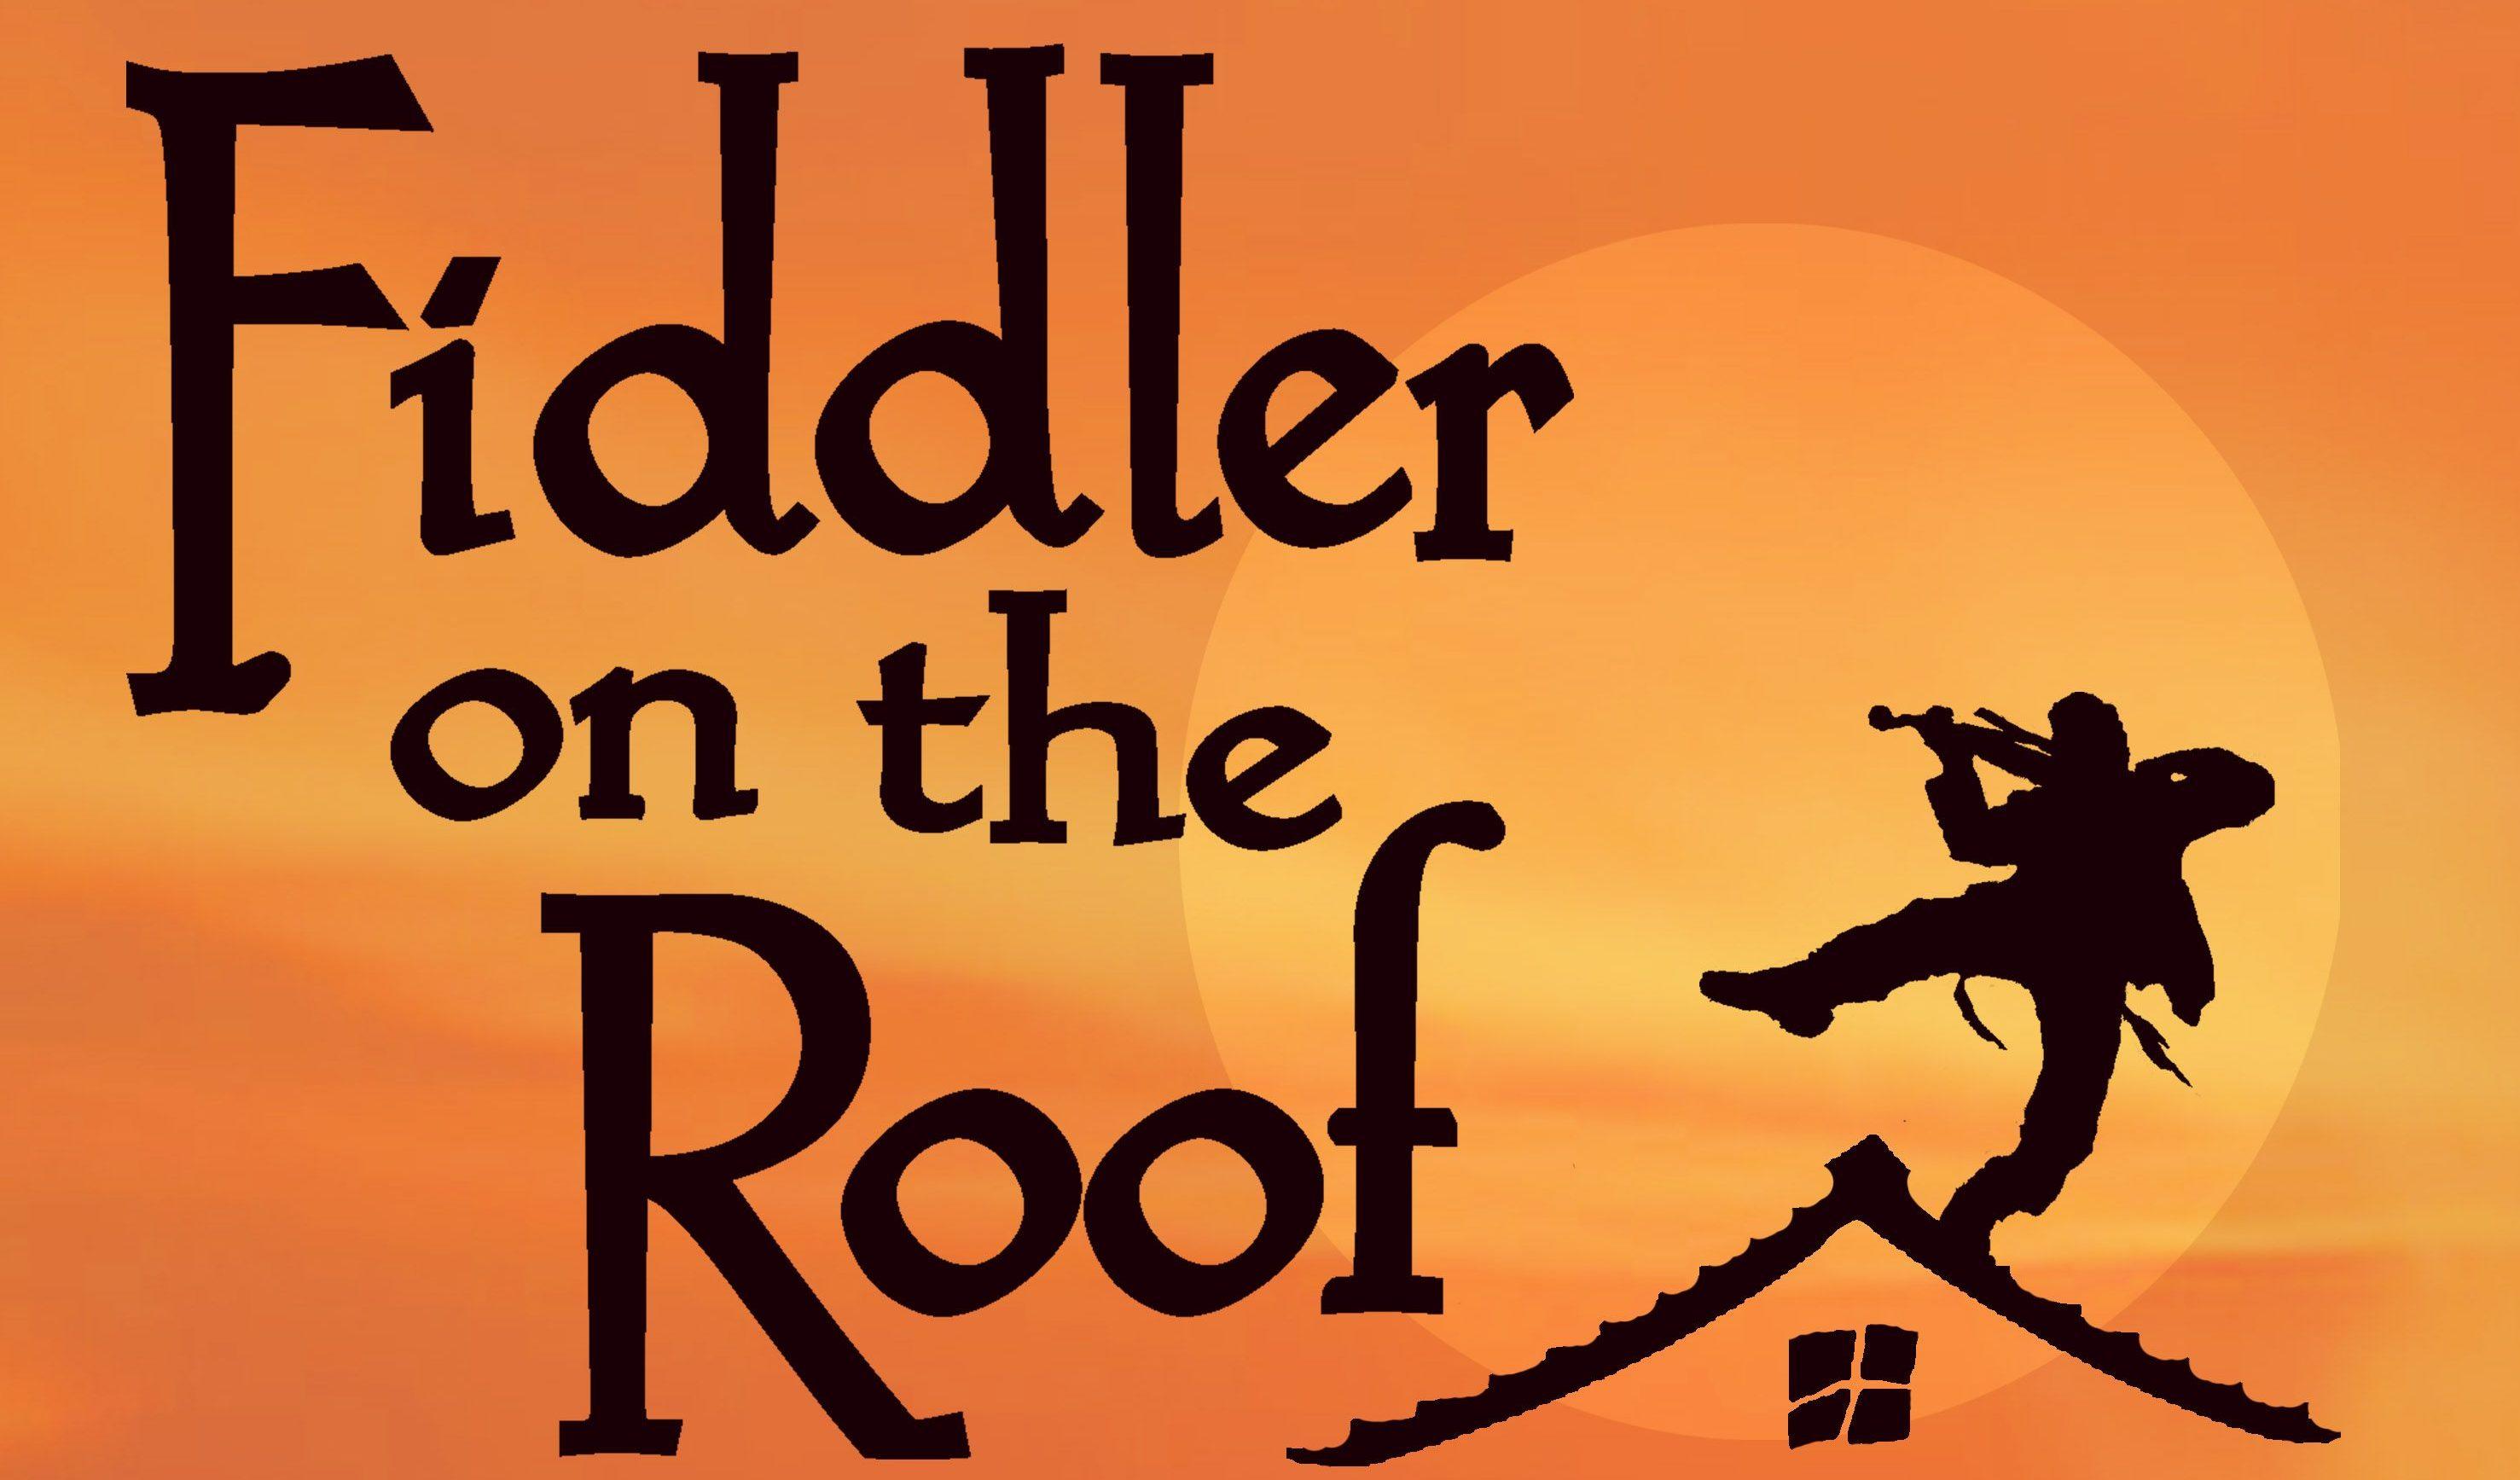 fiddler_roof_logo